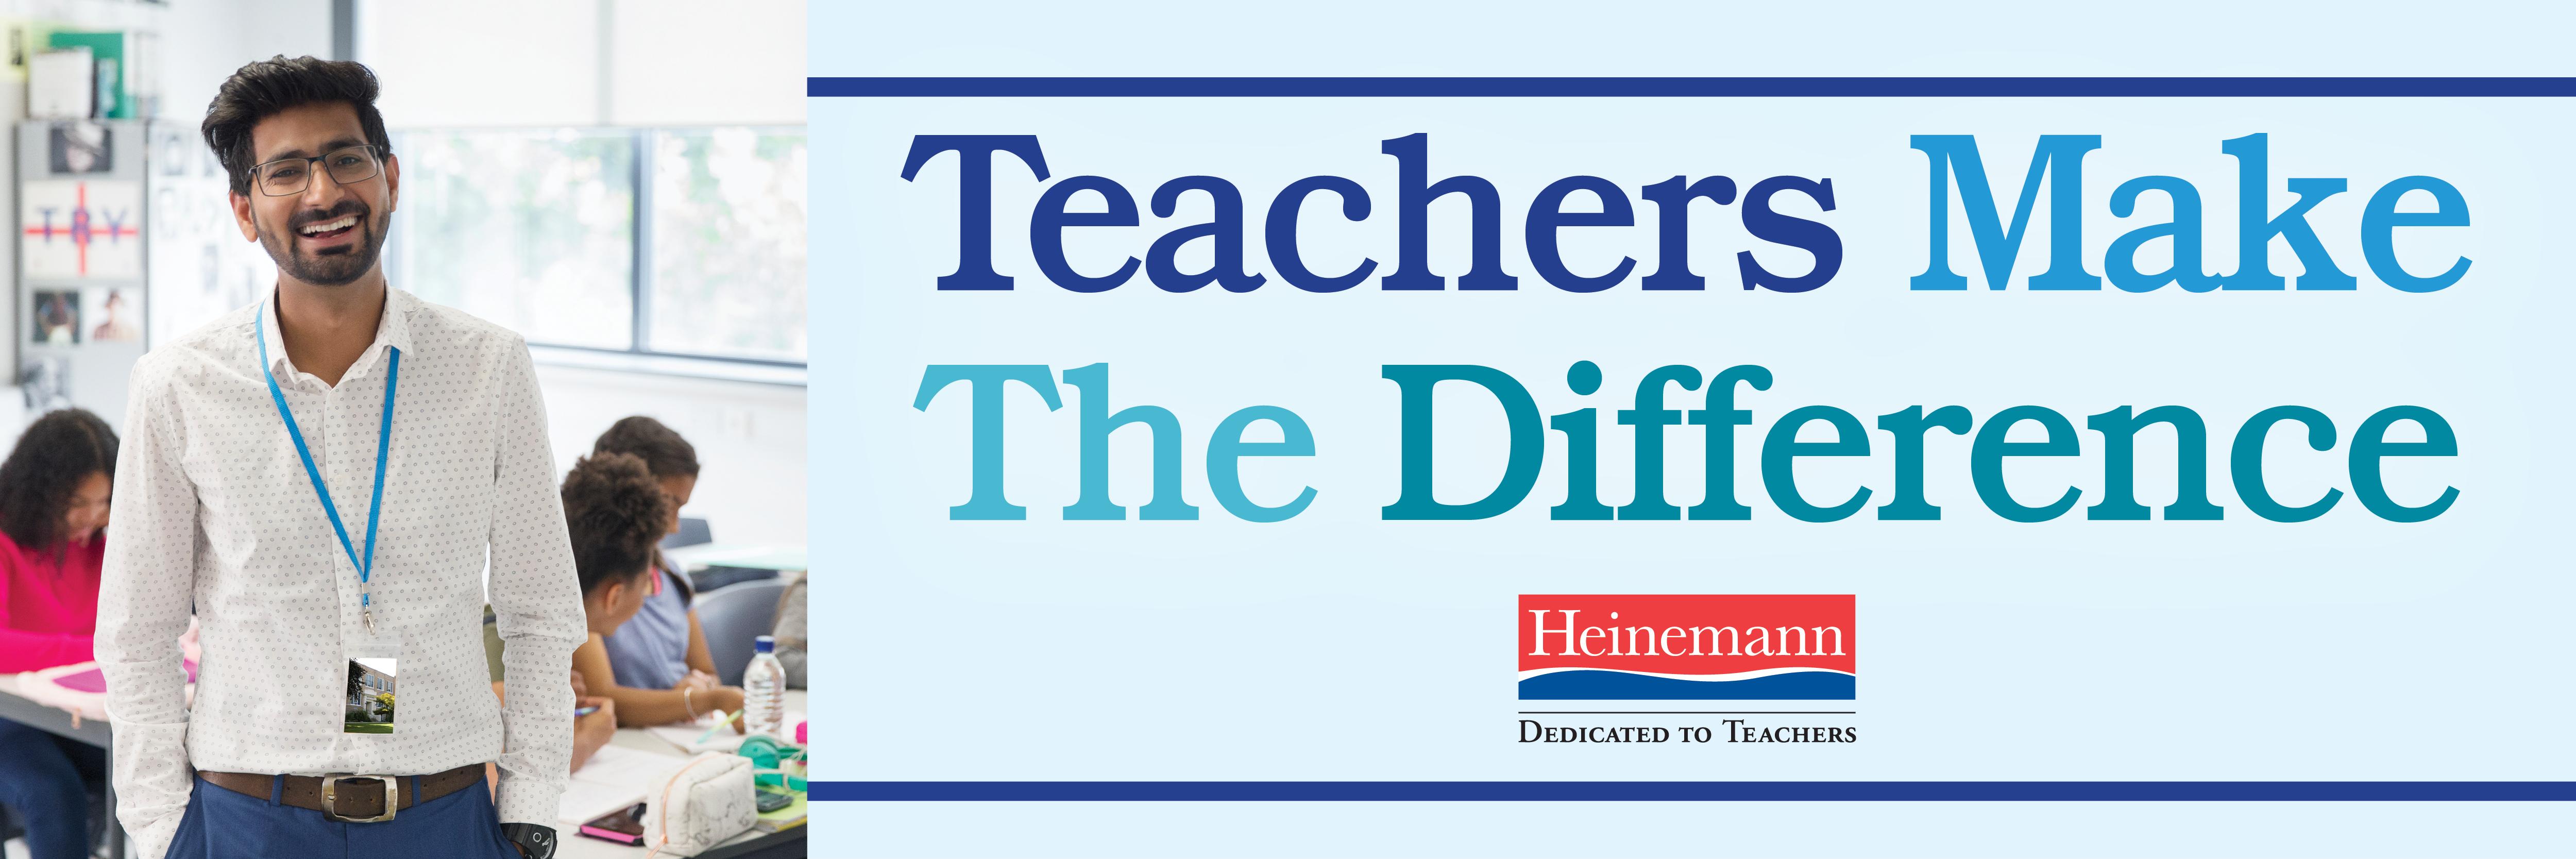 Banner_1200x400 - teachers make a difference (1)